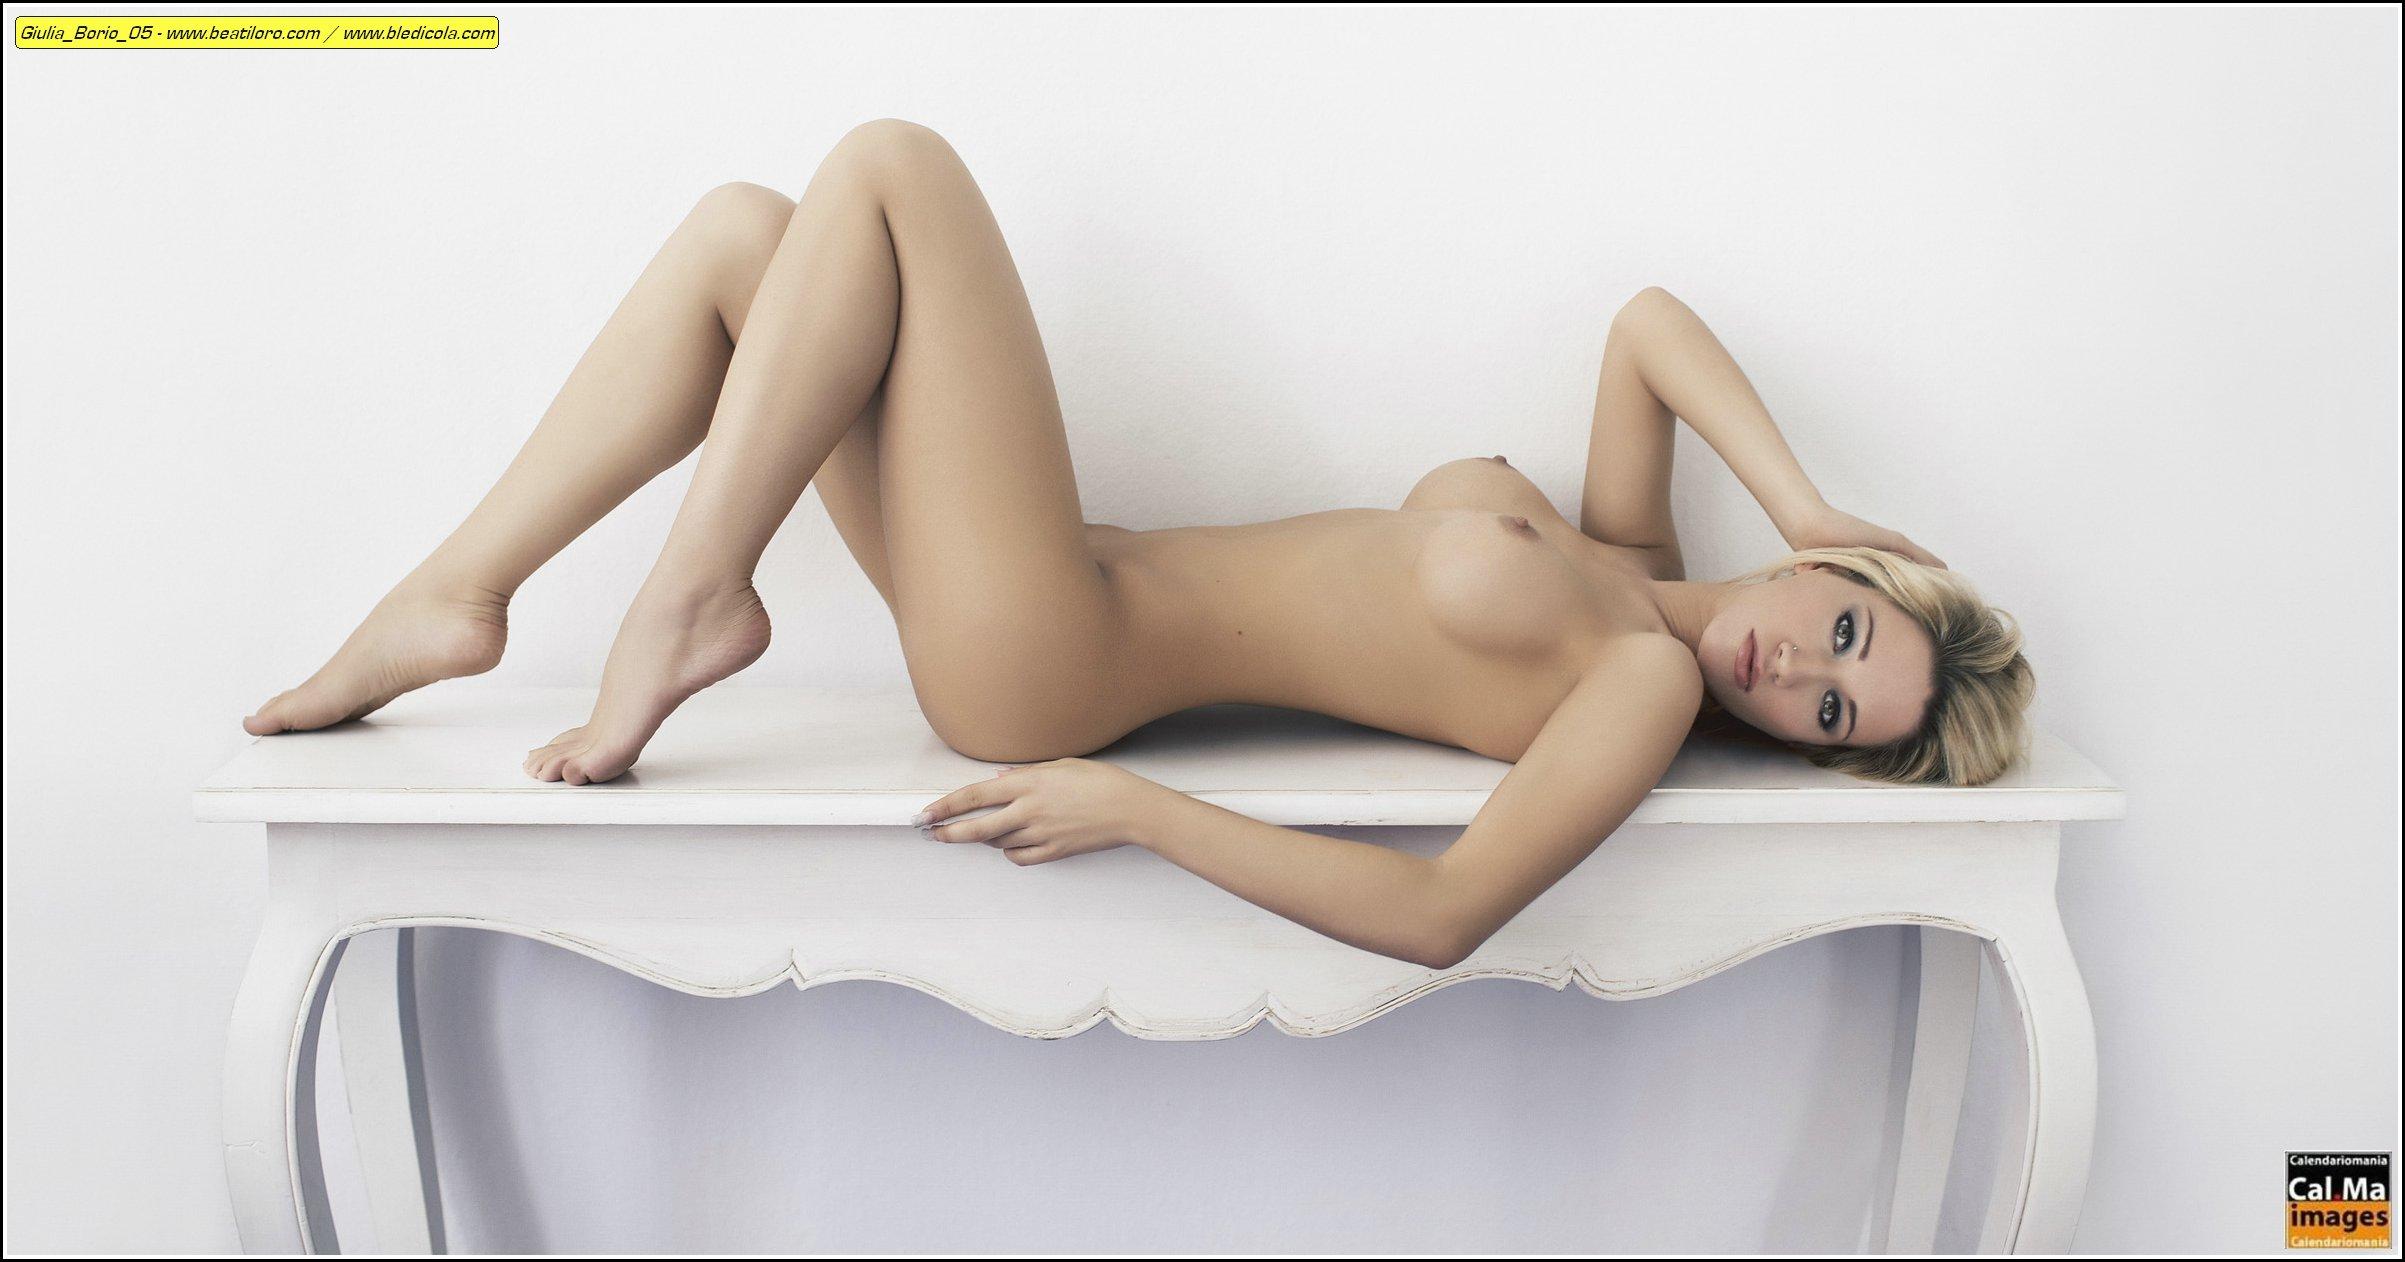 hot sexy photo of mariella tiemann cleavage boobs topless bikini